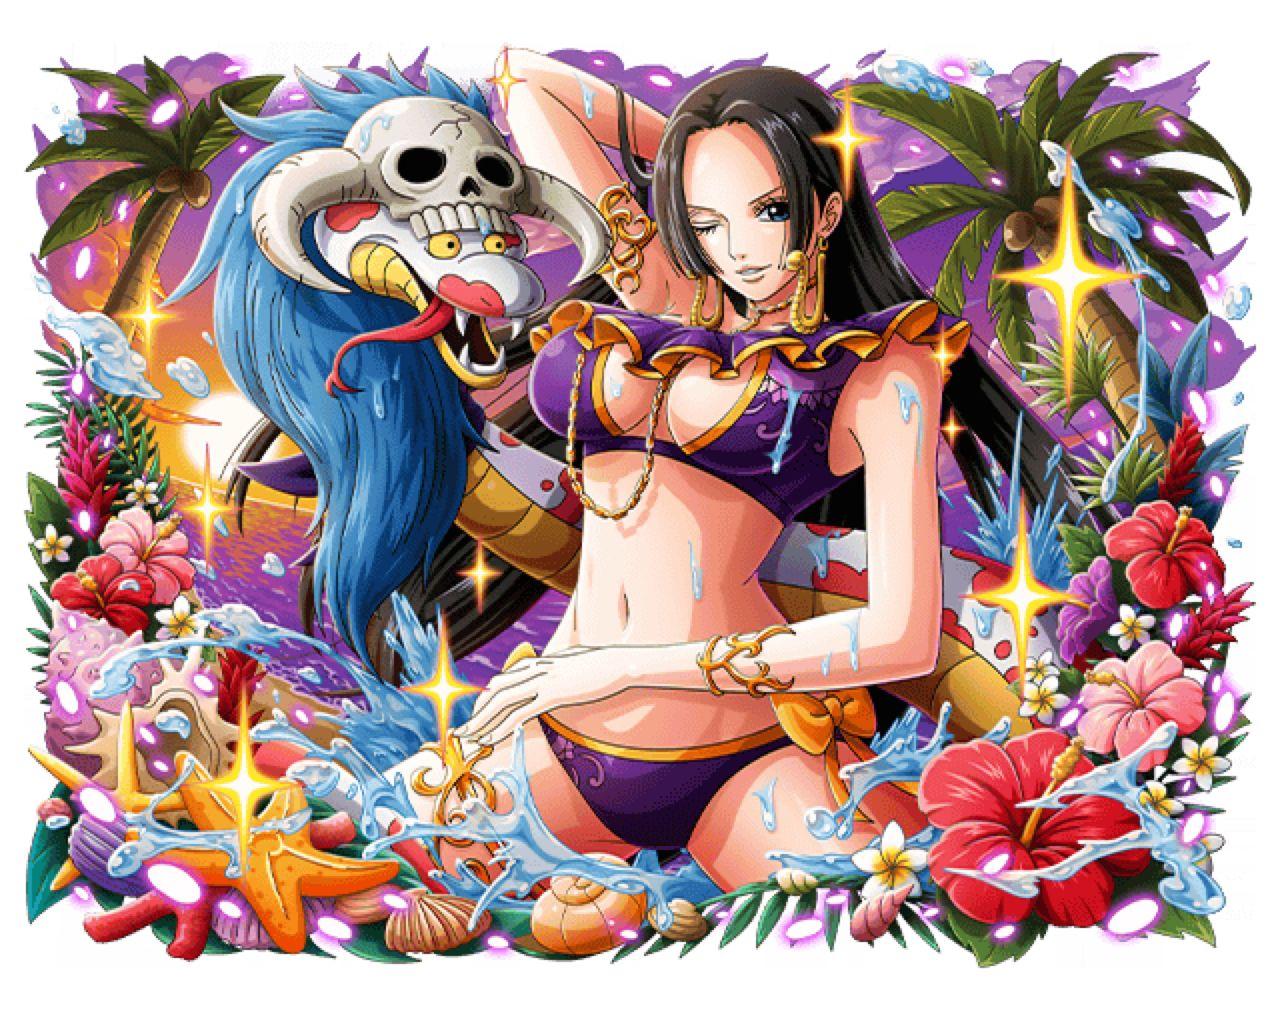 boa hancock summer pirate empress by mystig0 on deviantart manga anime one piece one piece manga one piece images